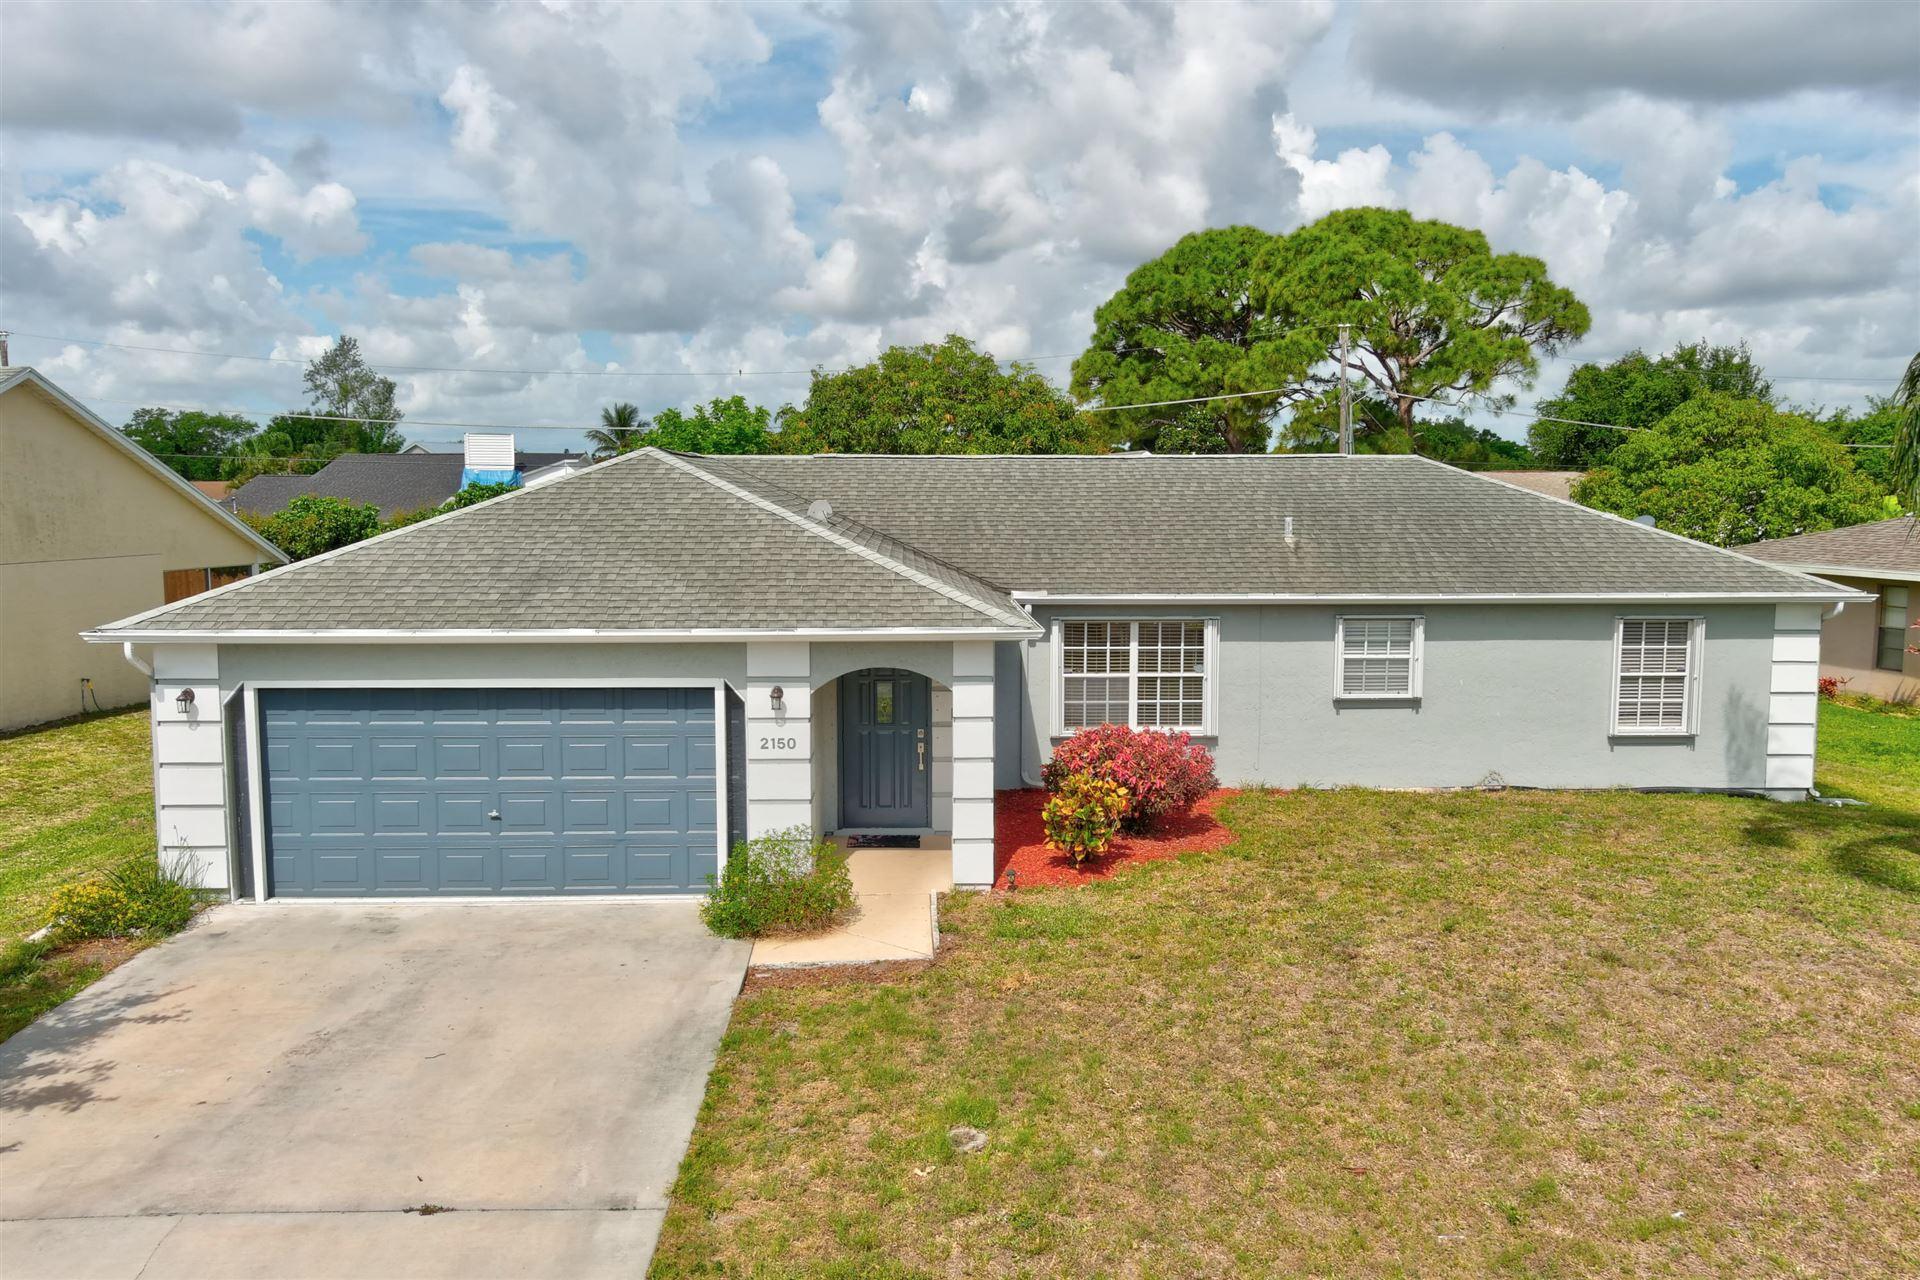 2150 SE Dolphin Road, Port Saint Lucie, FL 34952 - MLS#: RX-10715057